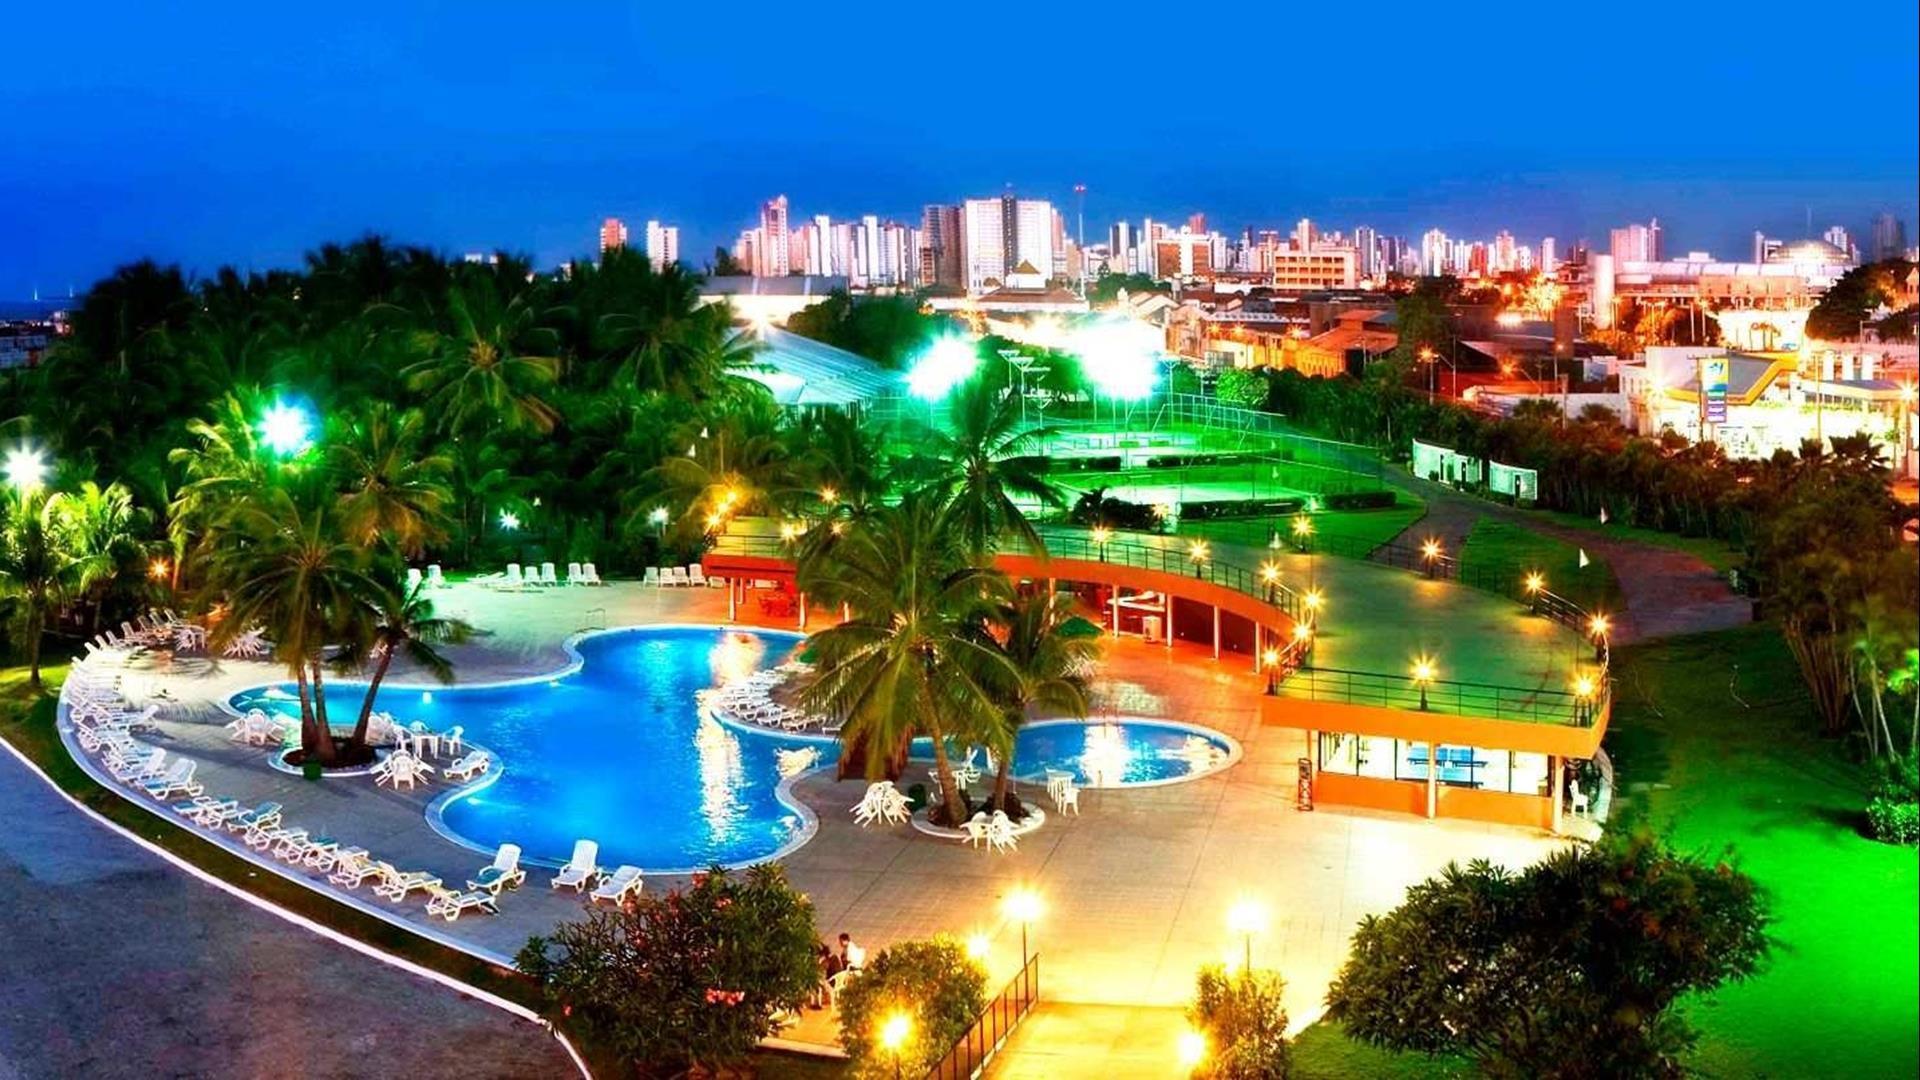 Brasilien Fortaleza: Deluxe Hotel - Hotel Marina Park